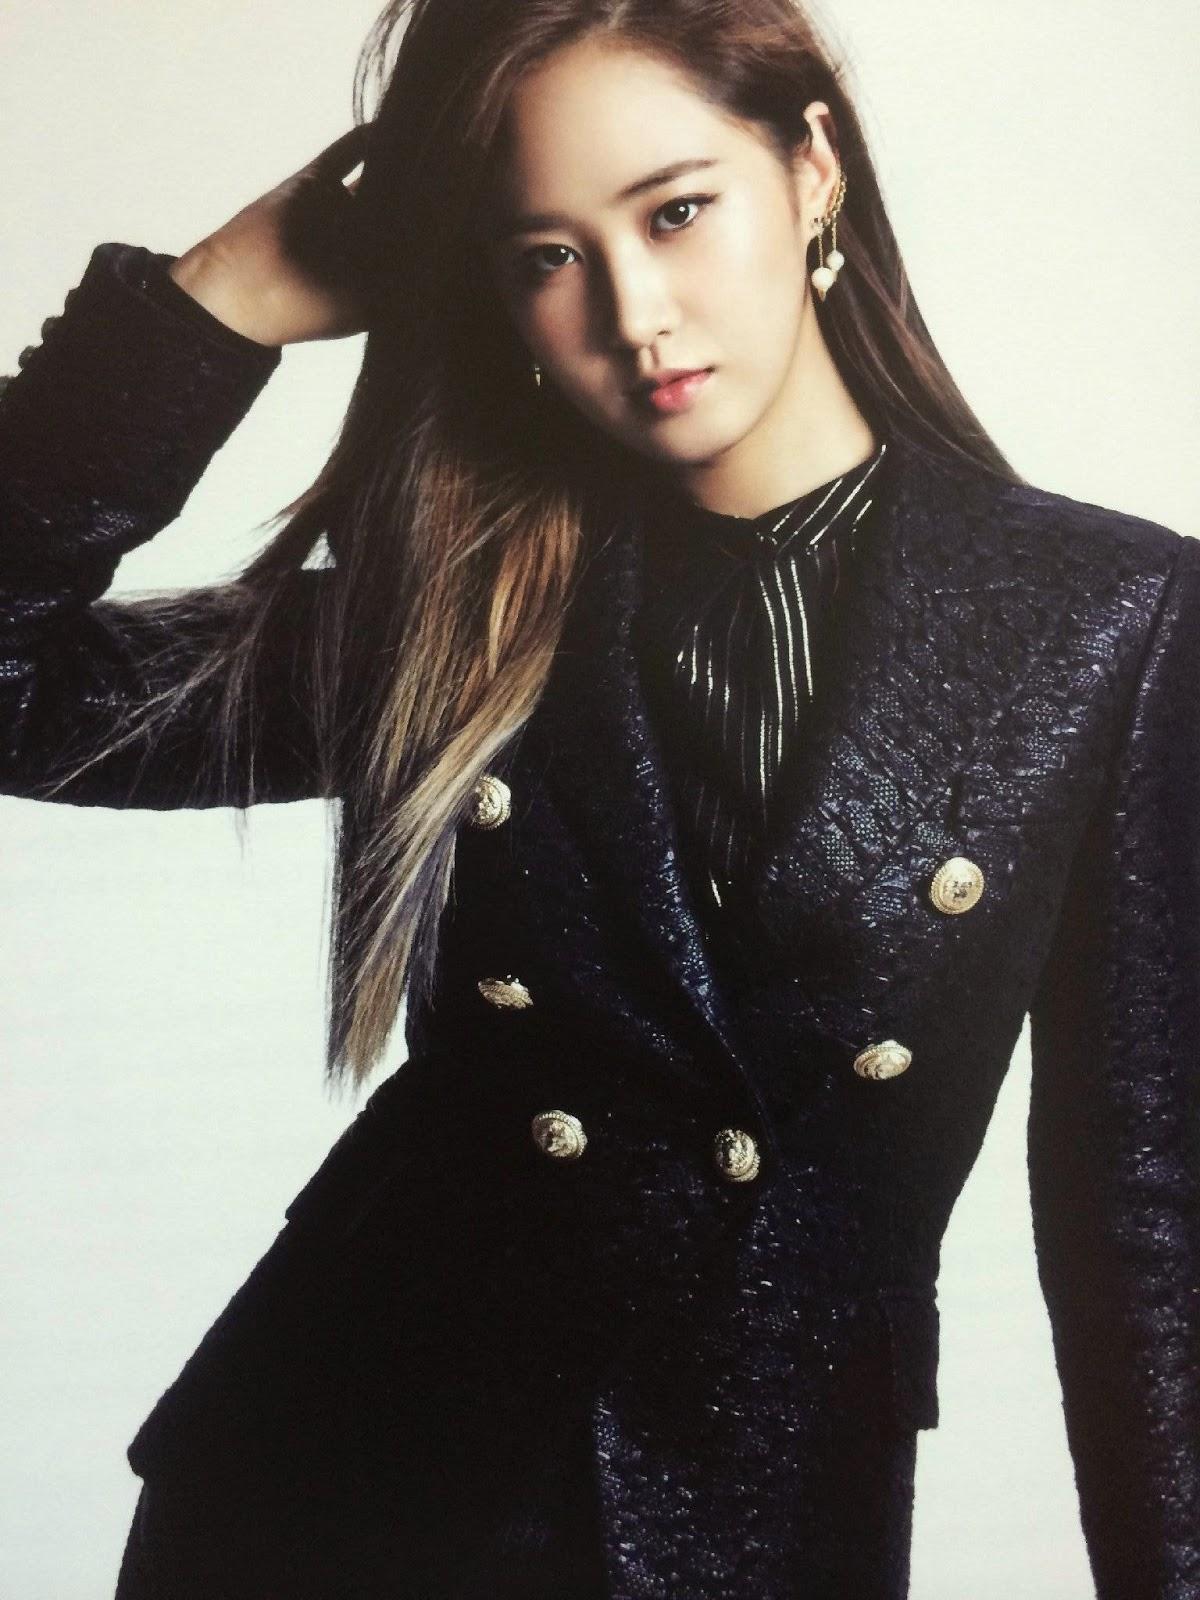 SNSD Yuri (유리; ユリ) Girls Generation The Best Scan Photos 3